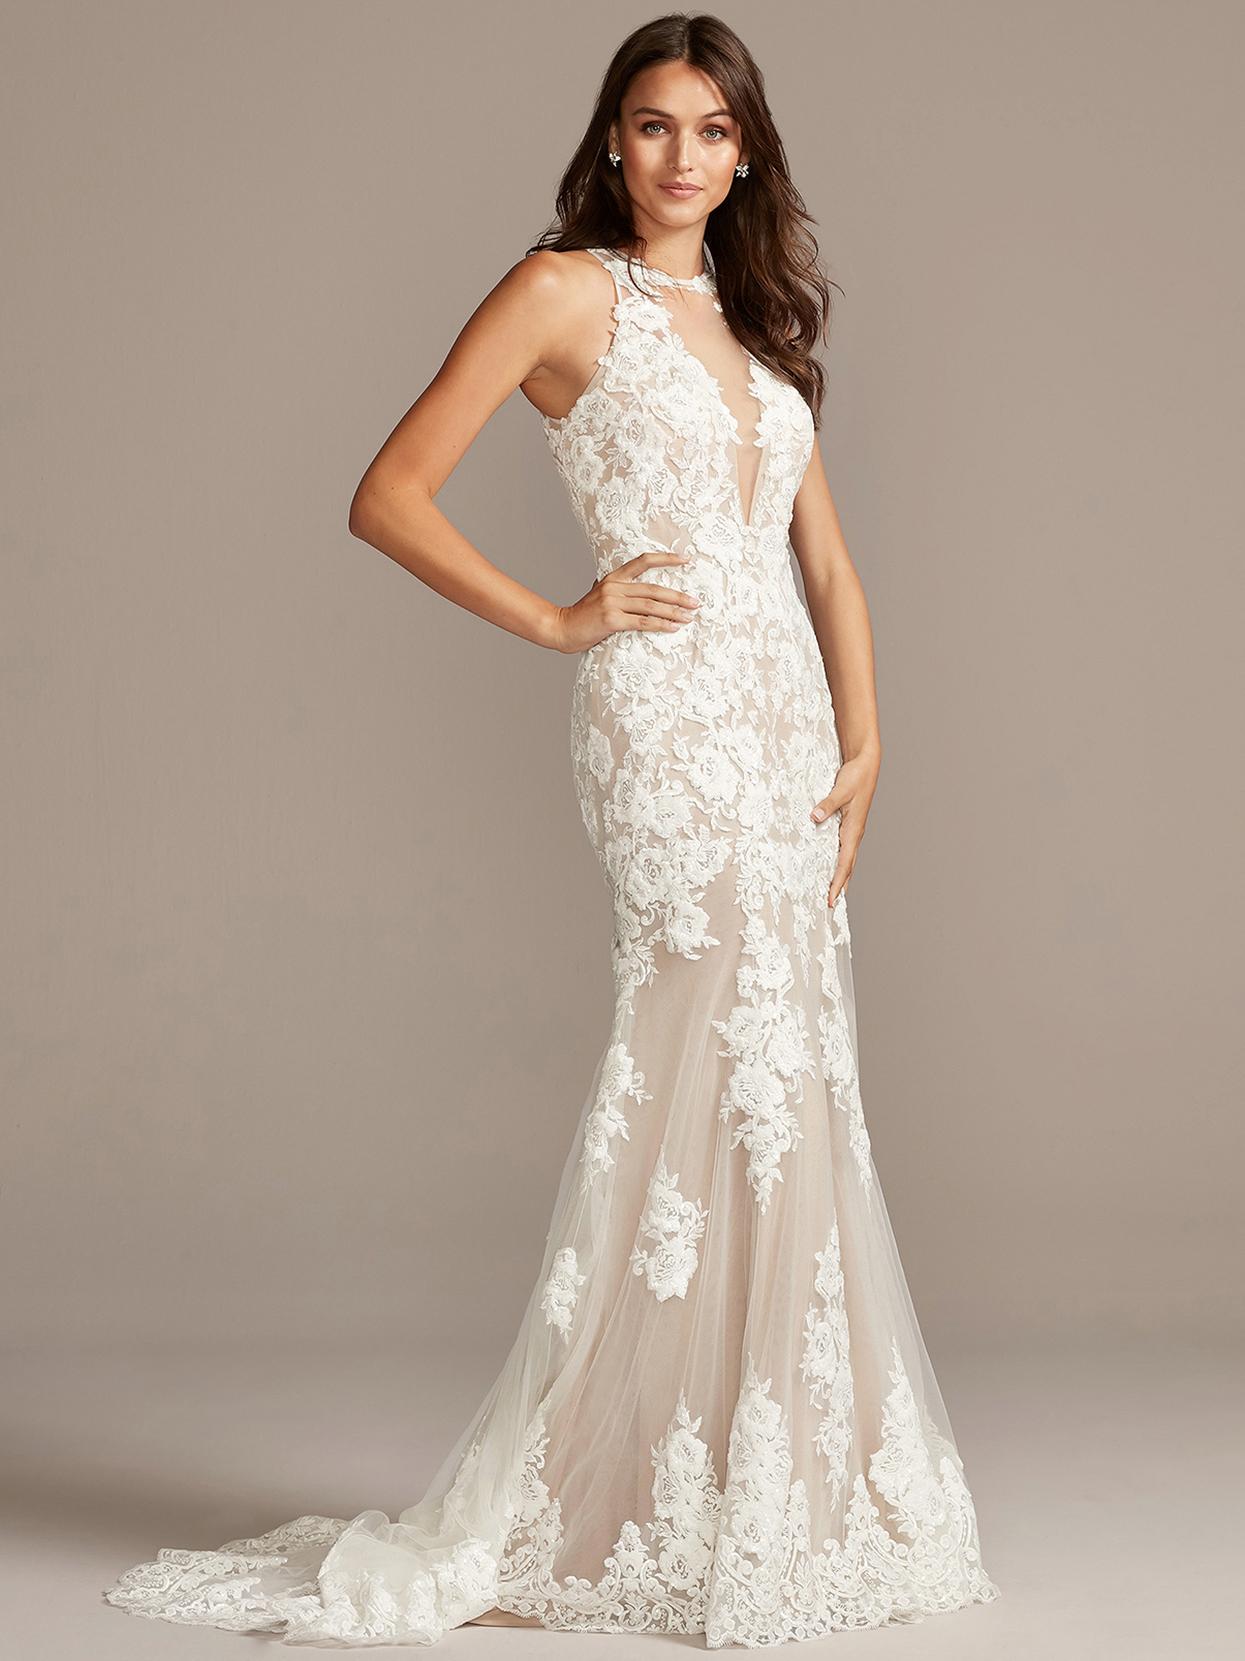 davids bridal galina high illusion-neck lace wedding dress fall 2020